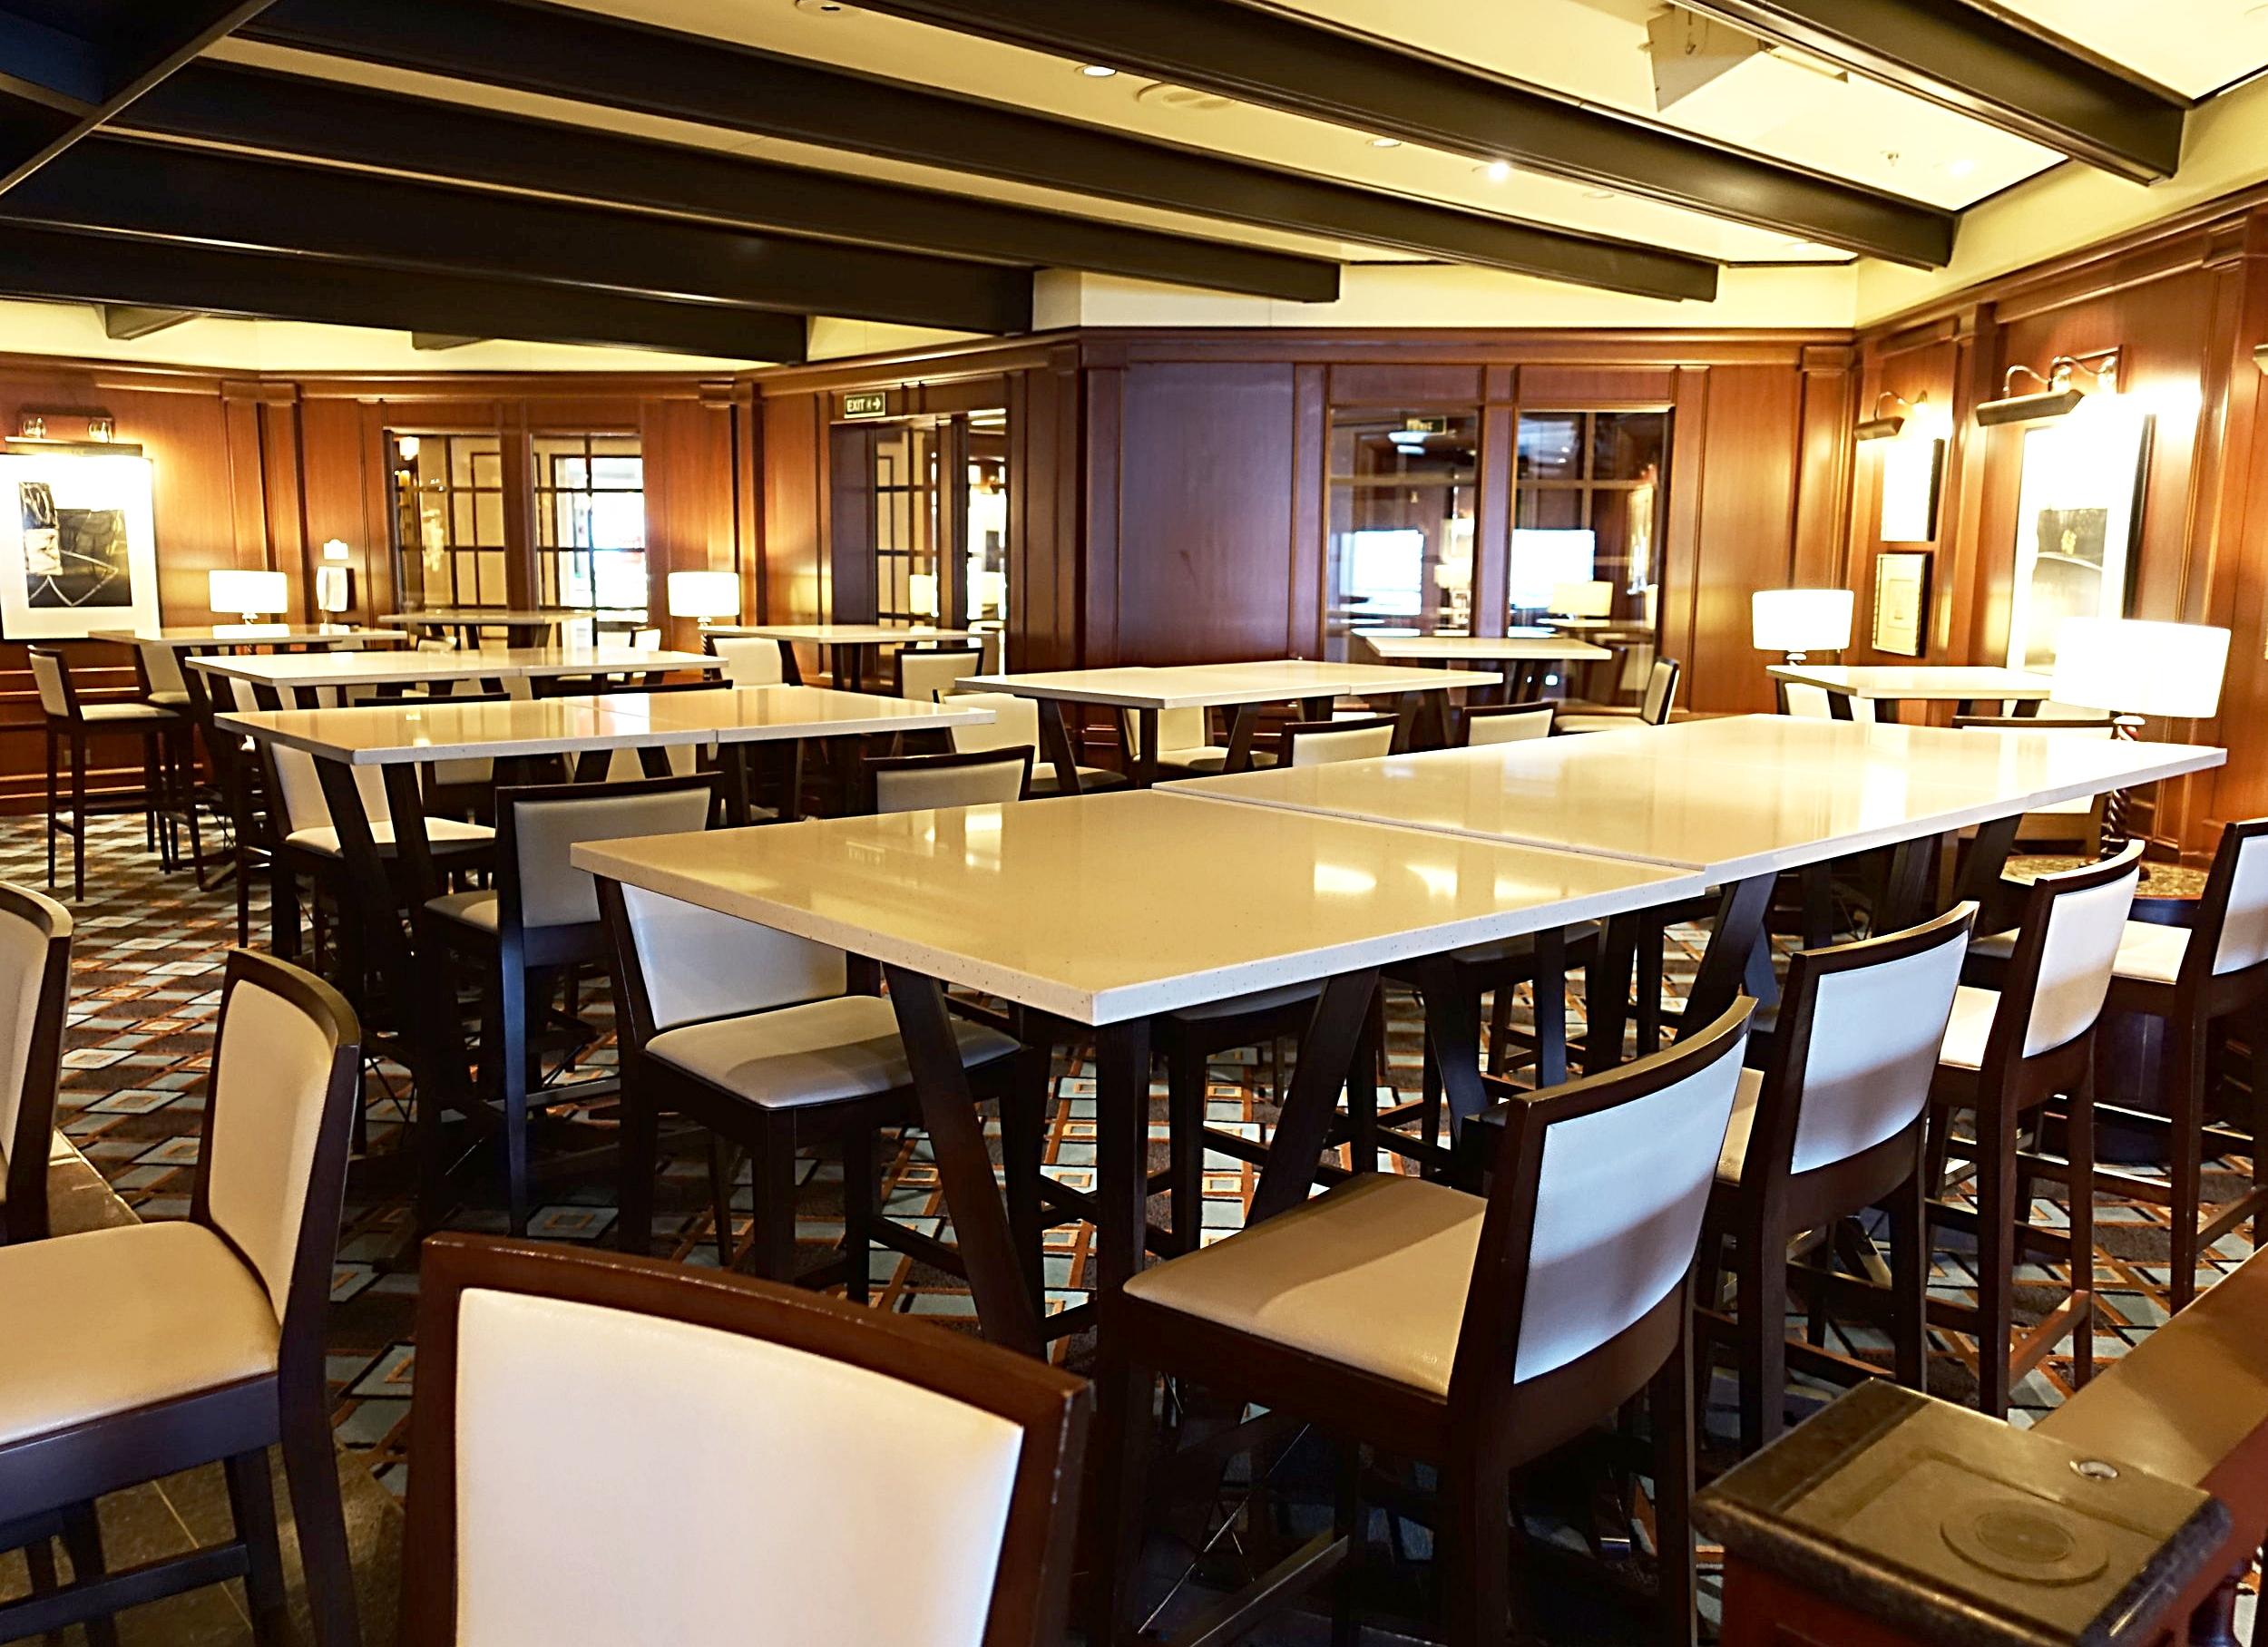 The Salty Dog dining section of the Wheelhouse bar.